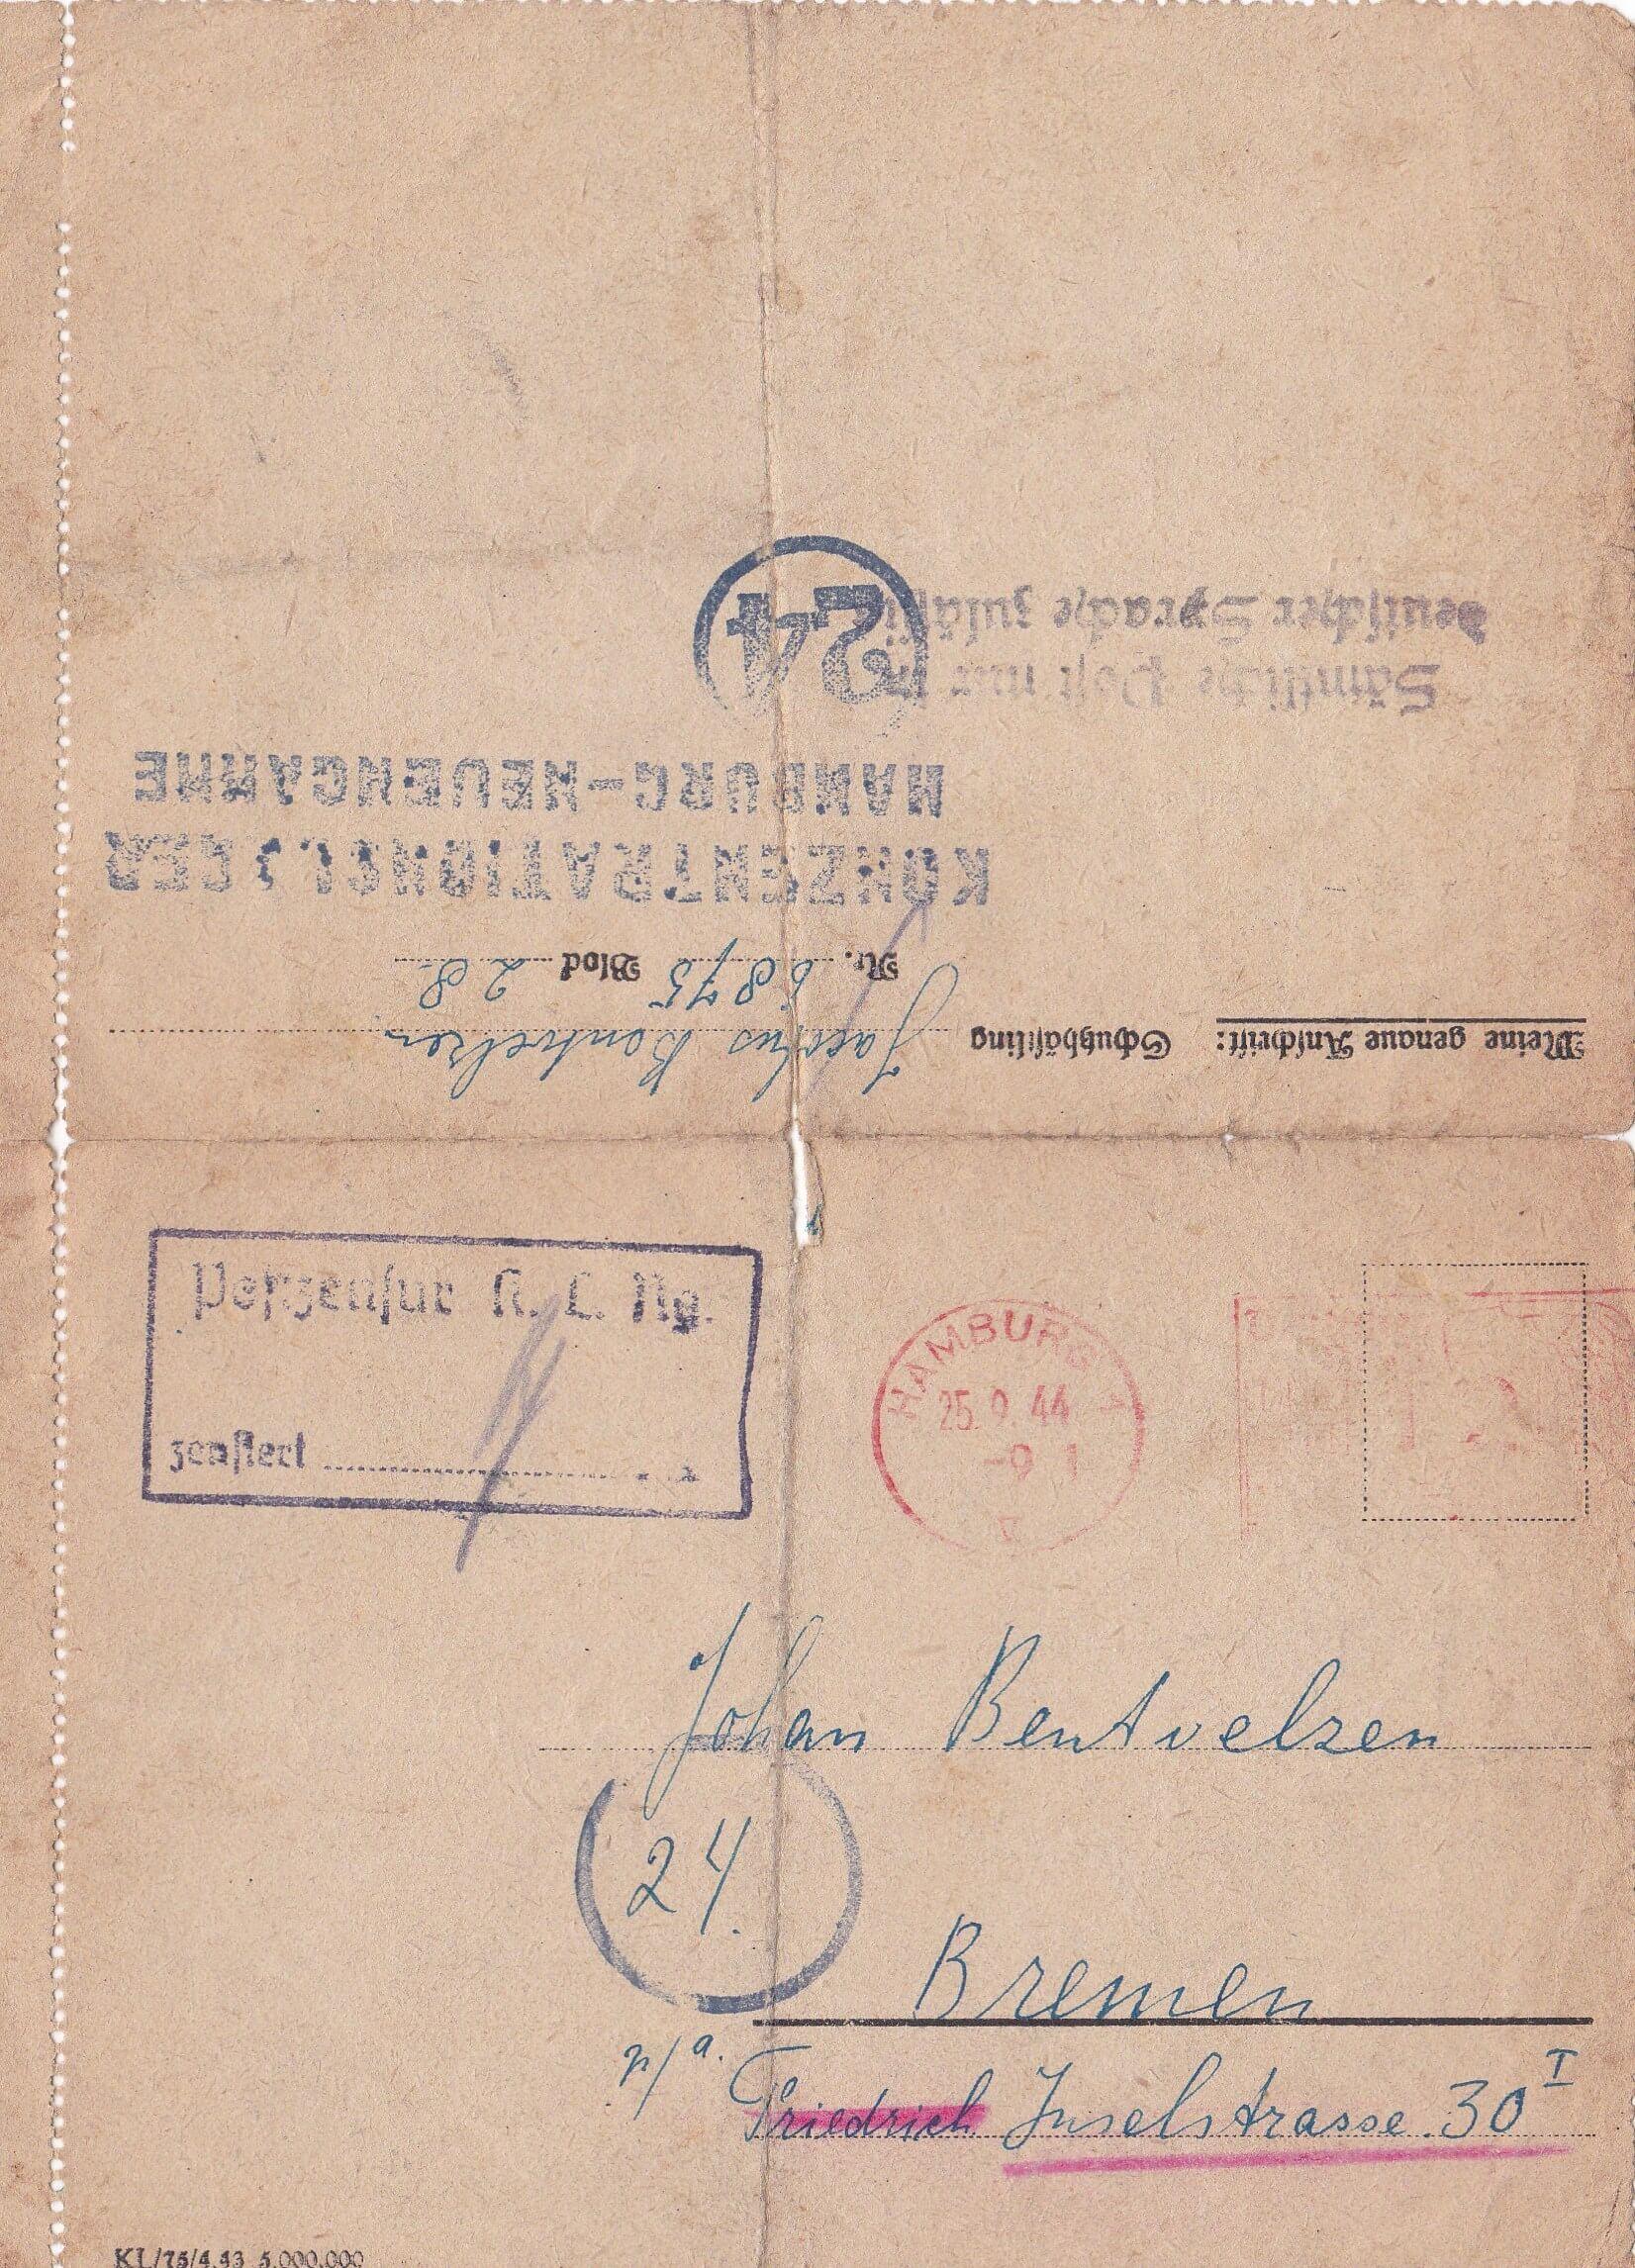 Concentratiekamp brieven Neuengamme wo2